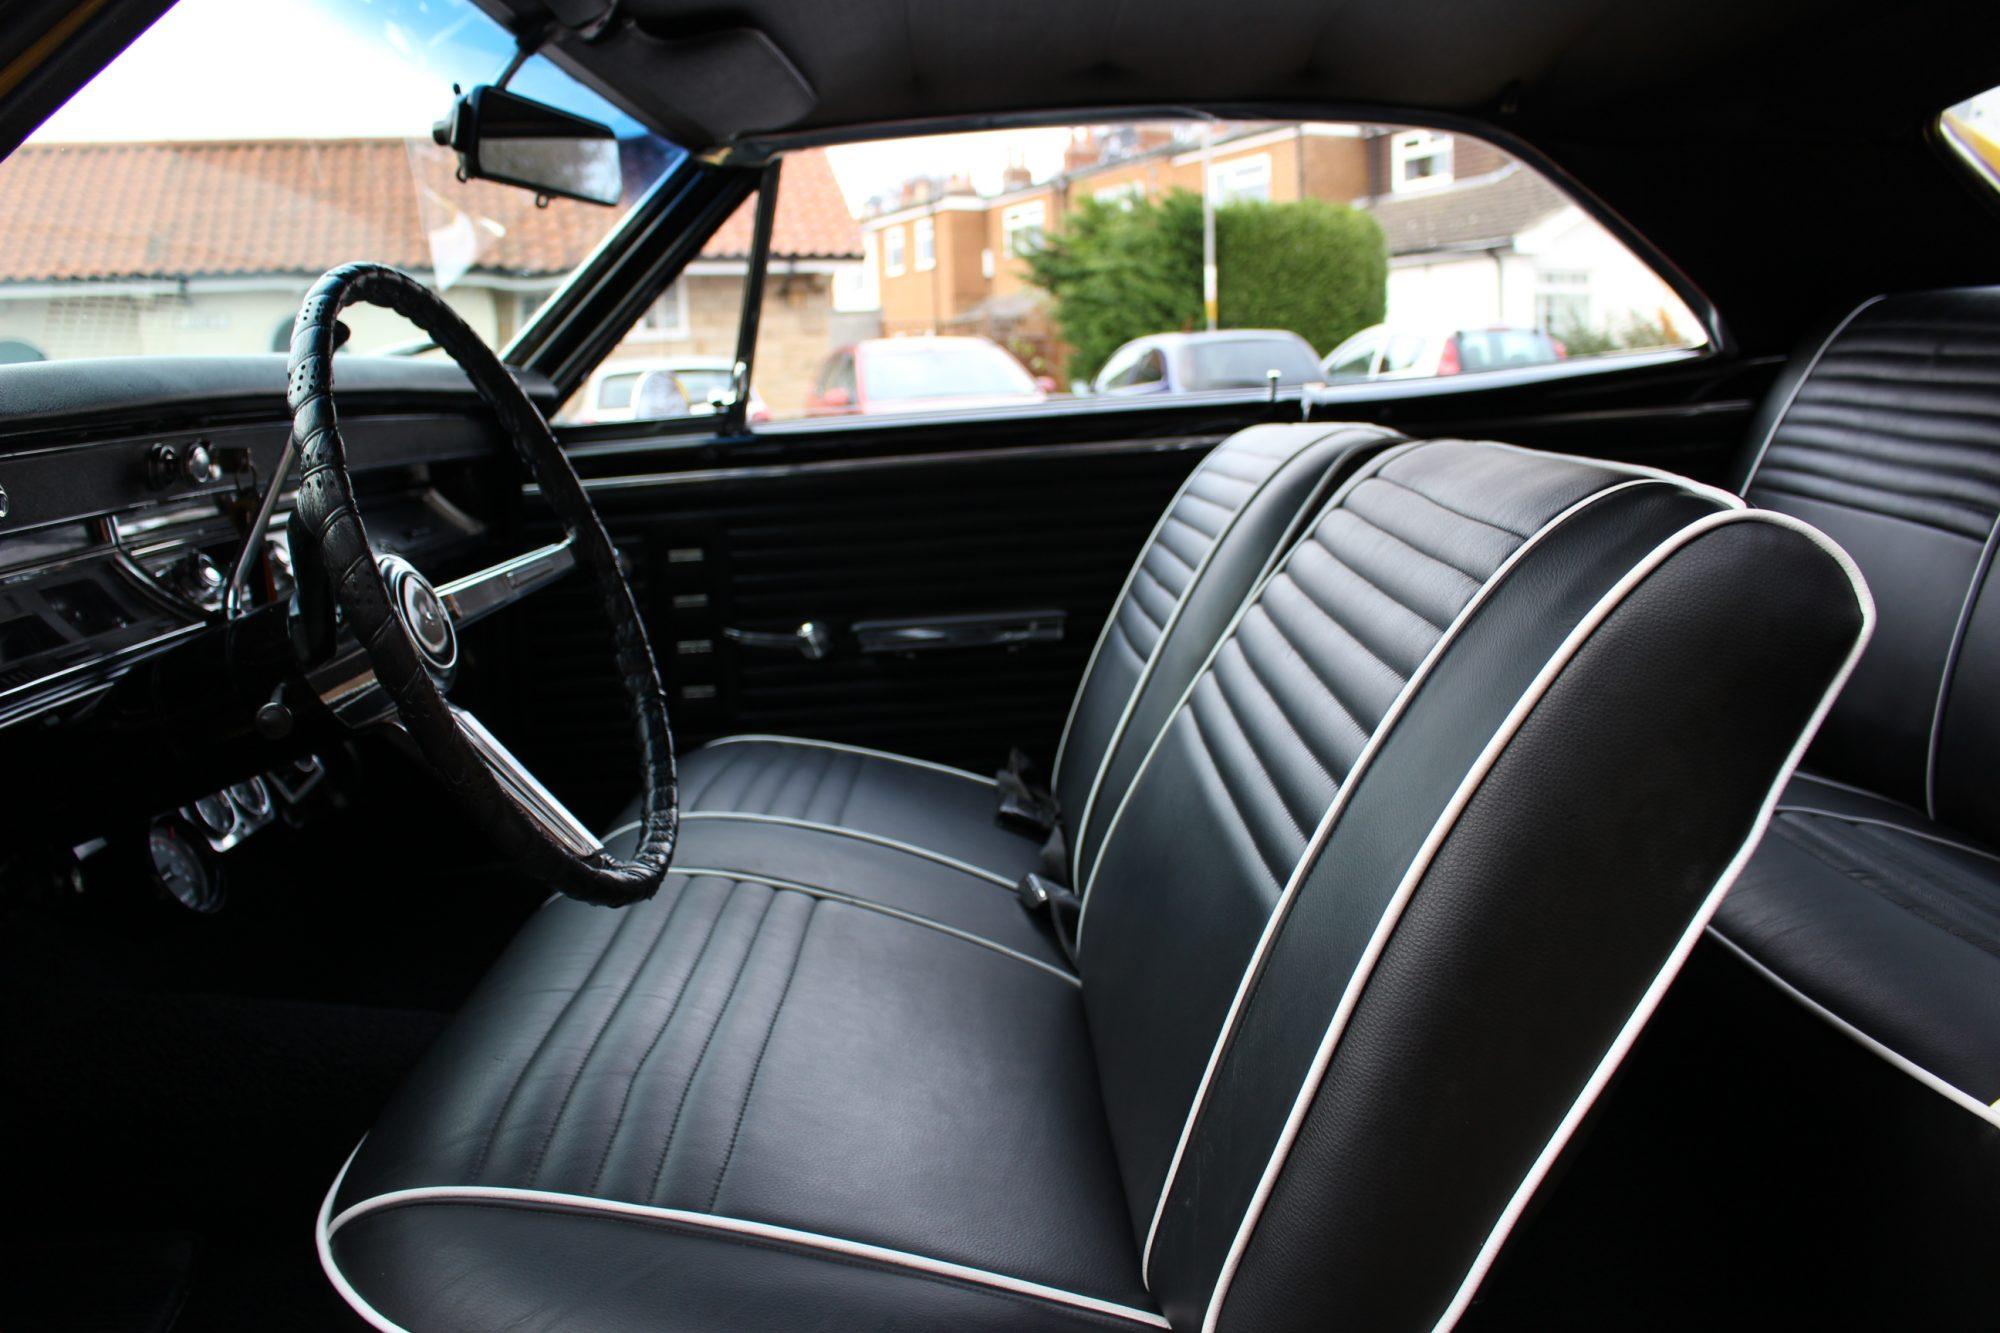 1967 Chevrolet Chevelle Malibu, Chevrolet, Cevrolet Chevelle, Chevelle, V8, muscle car, classic car, american car, hot rod, Cragar, motoring, automotive, classic car, retro car, carandclassic, carandclassic.co.uk,